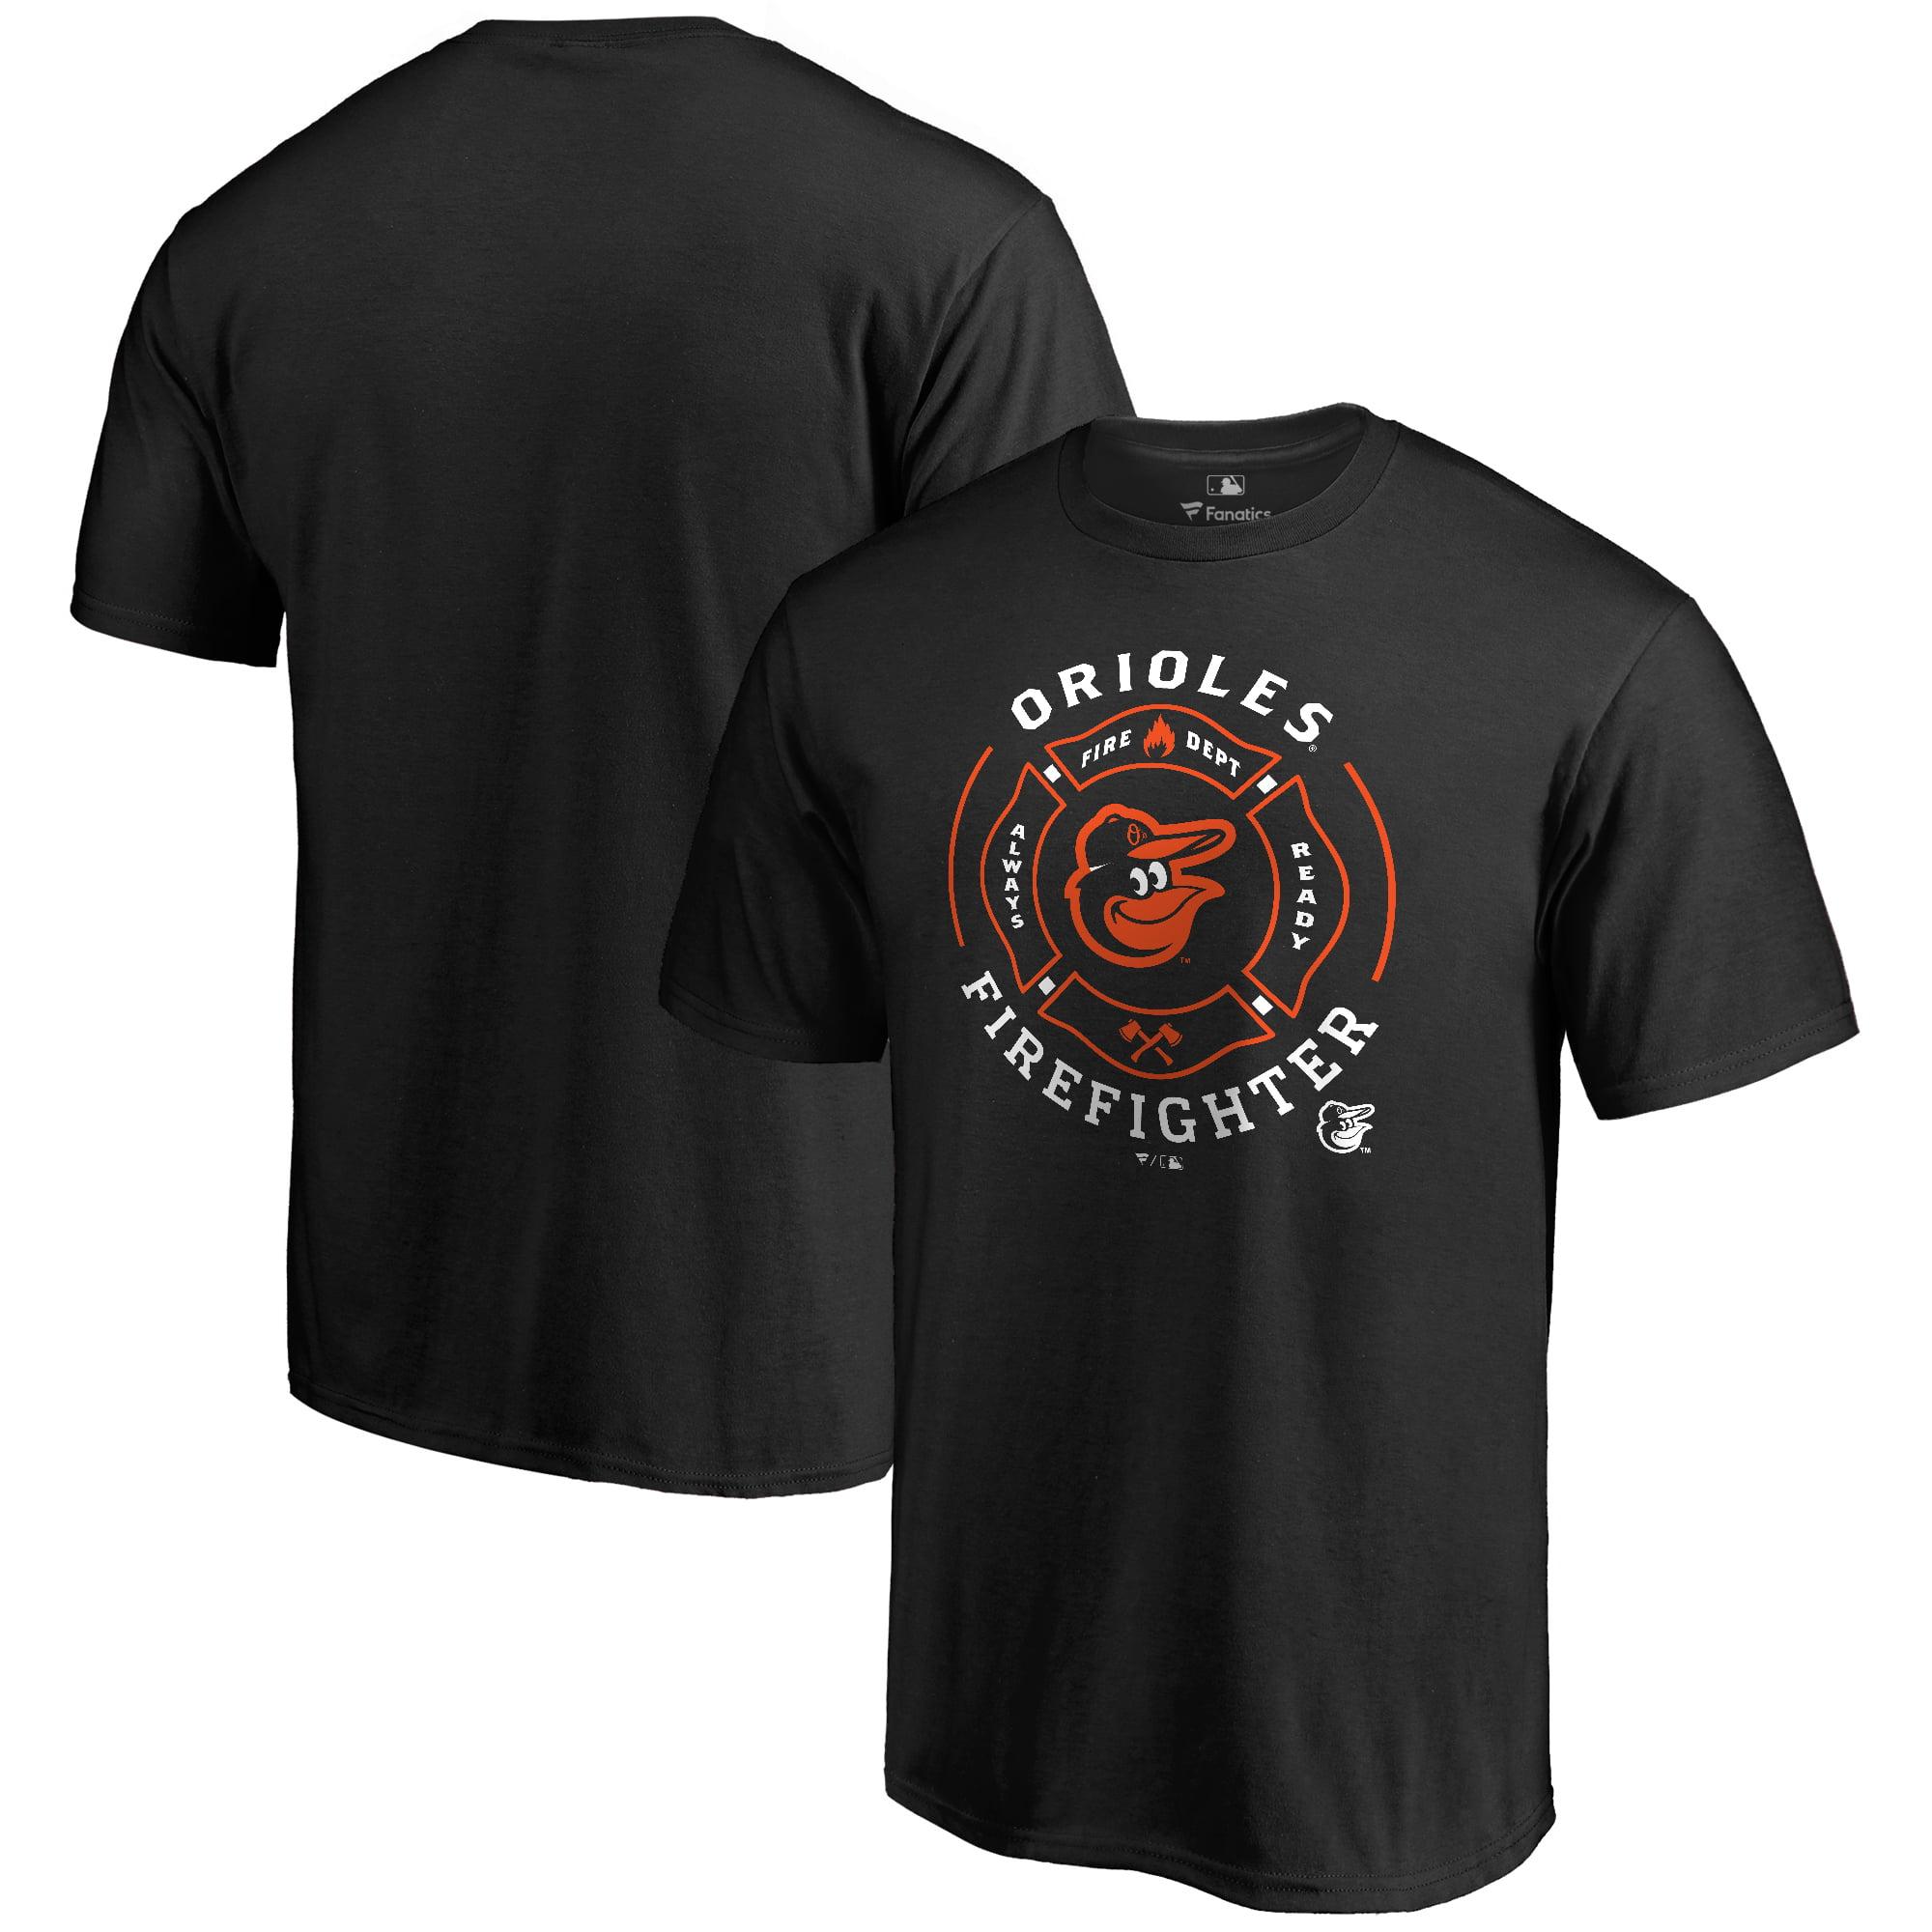 Baltimore Orioles Firefighter T-Shirt - Black